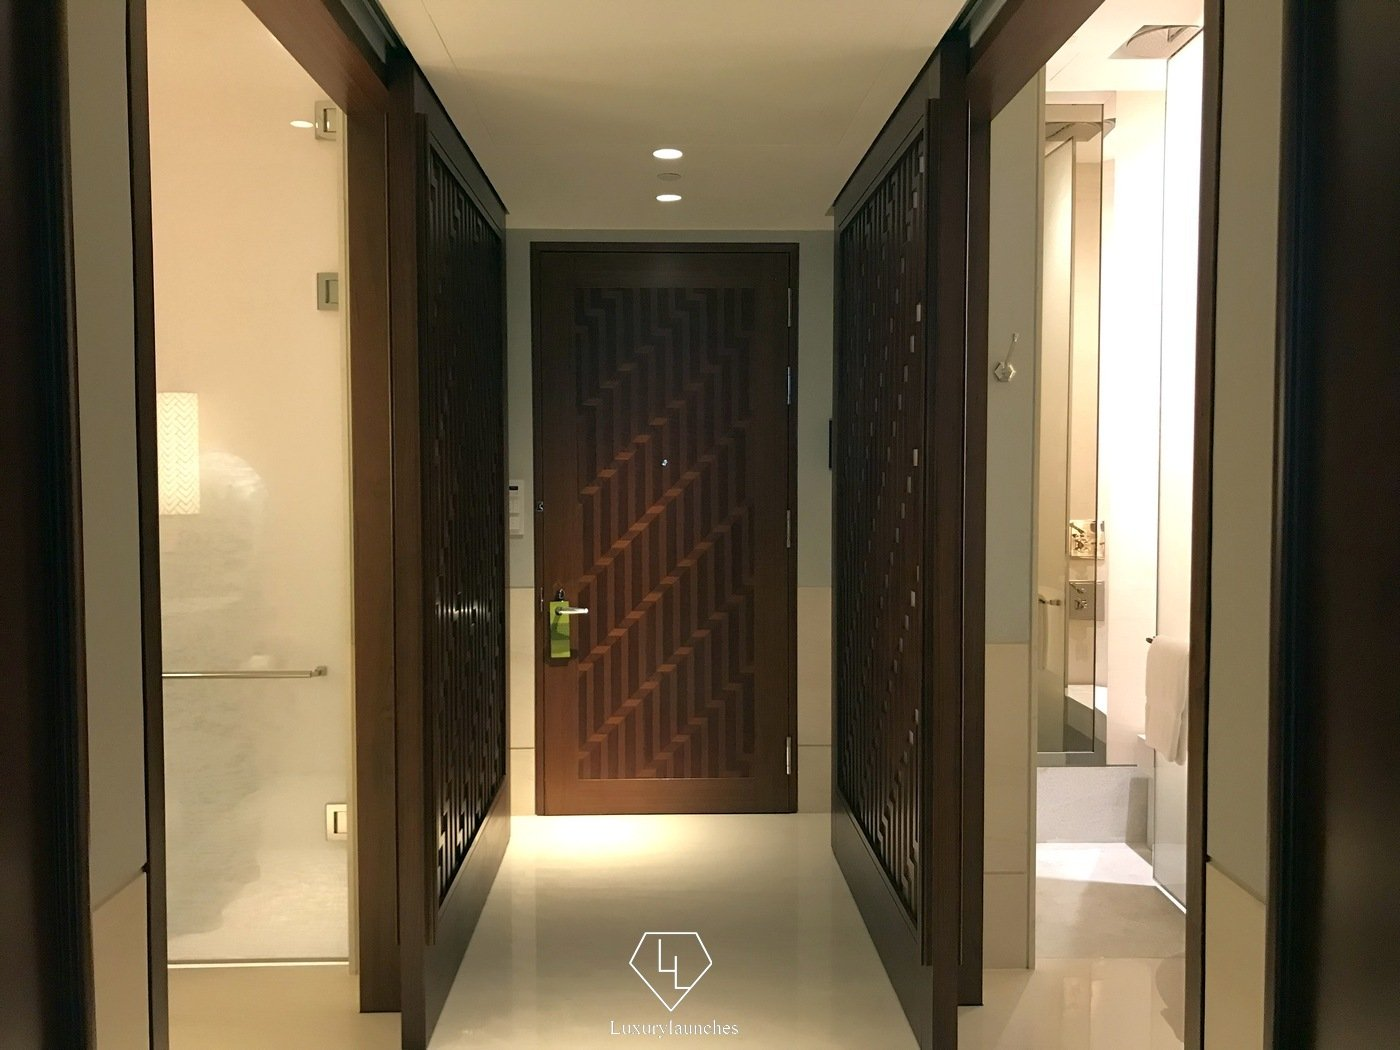 The-Capitol-Kempinski-bathroom-area.jpg (1400×1050)